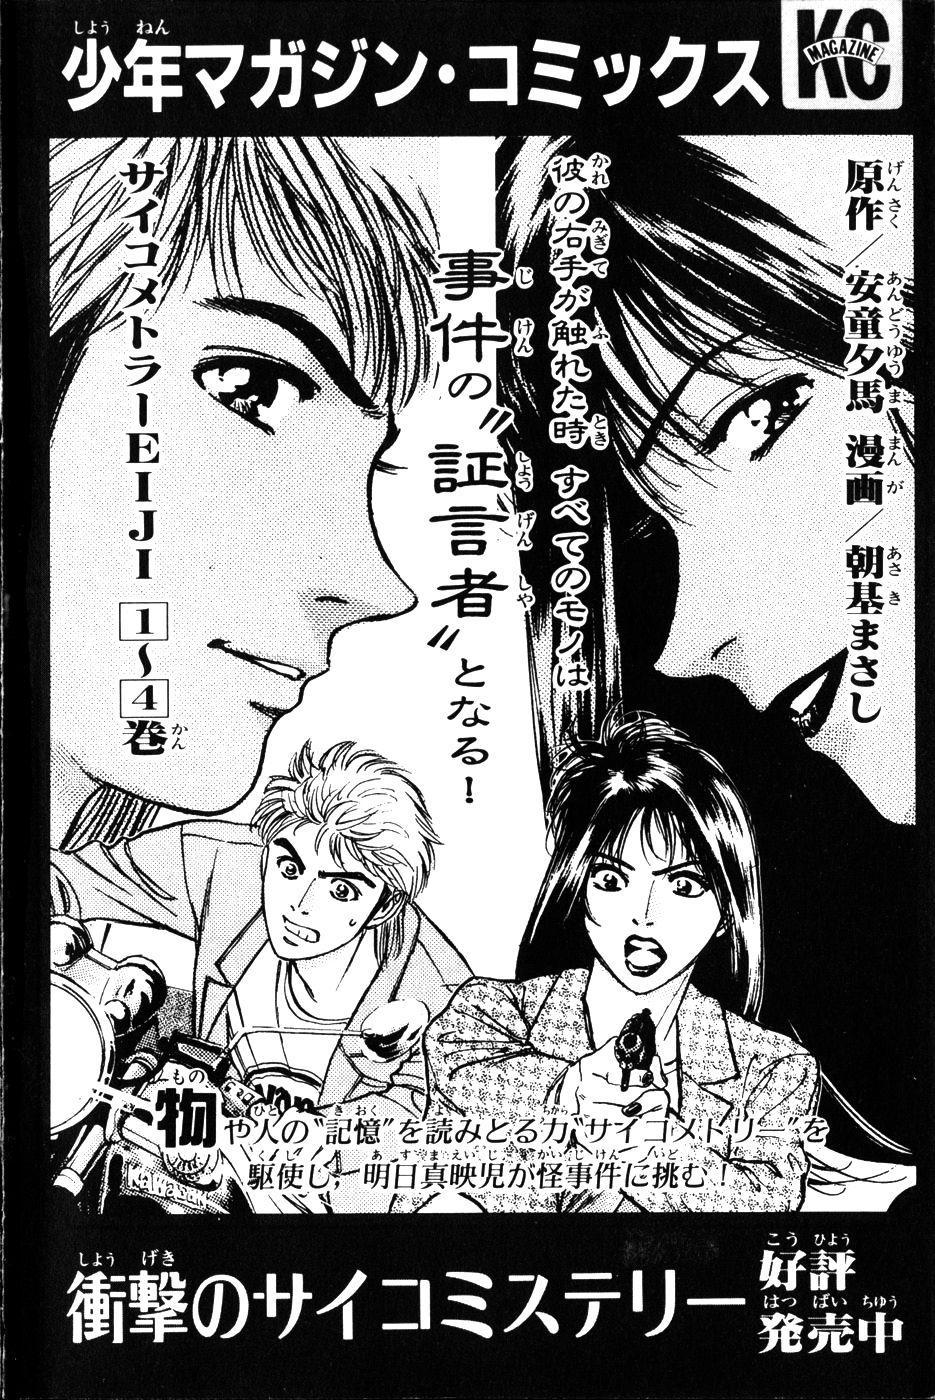 Psychometrer Eiji chapter 26 trang 32